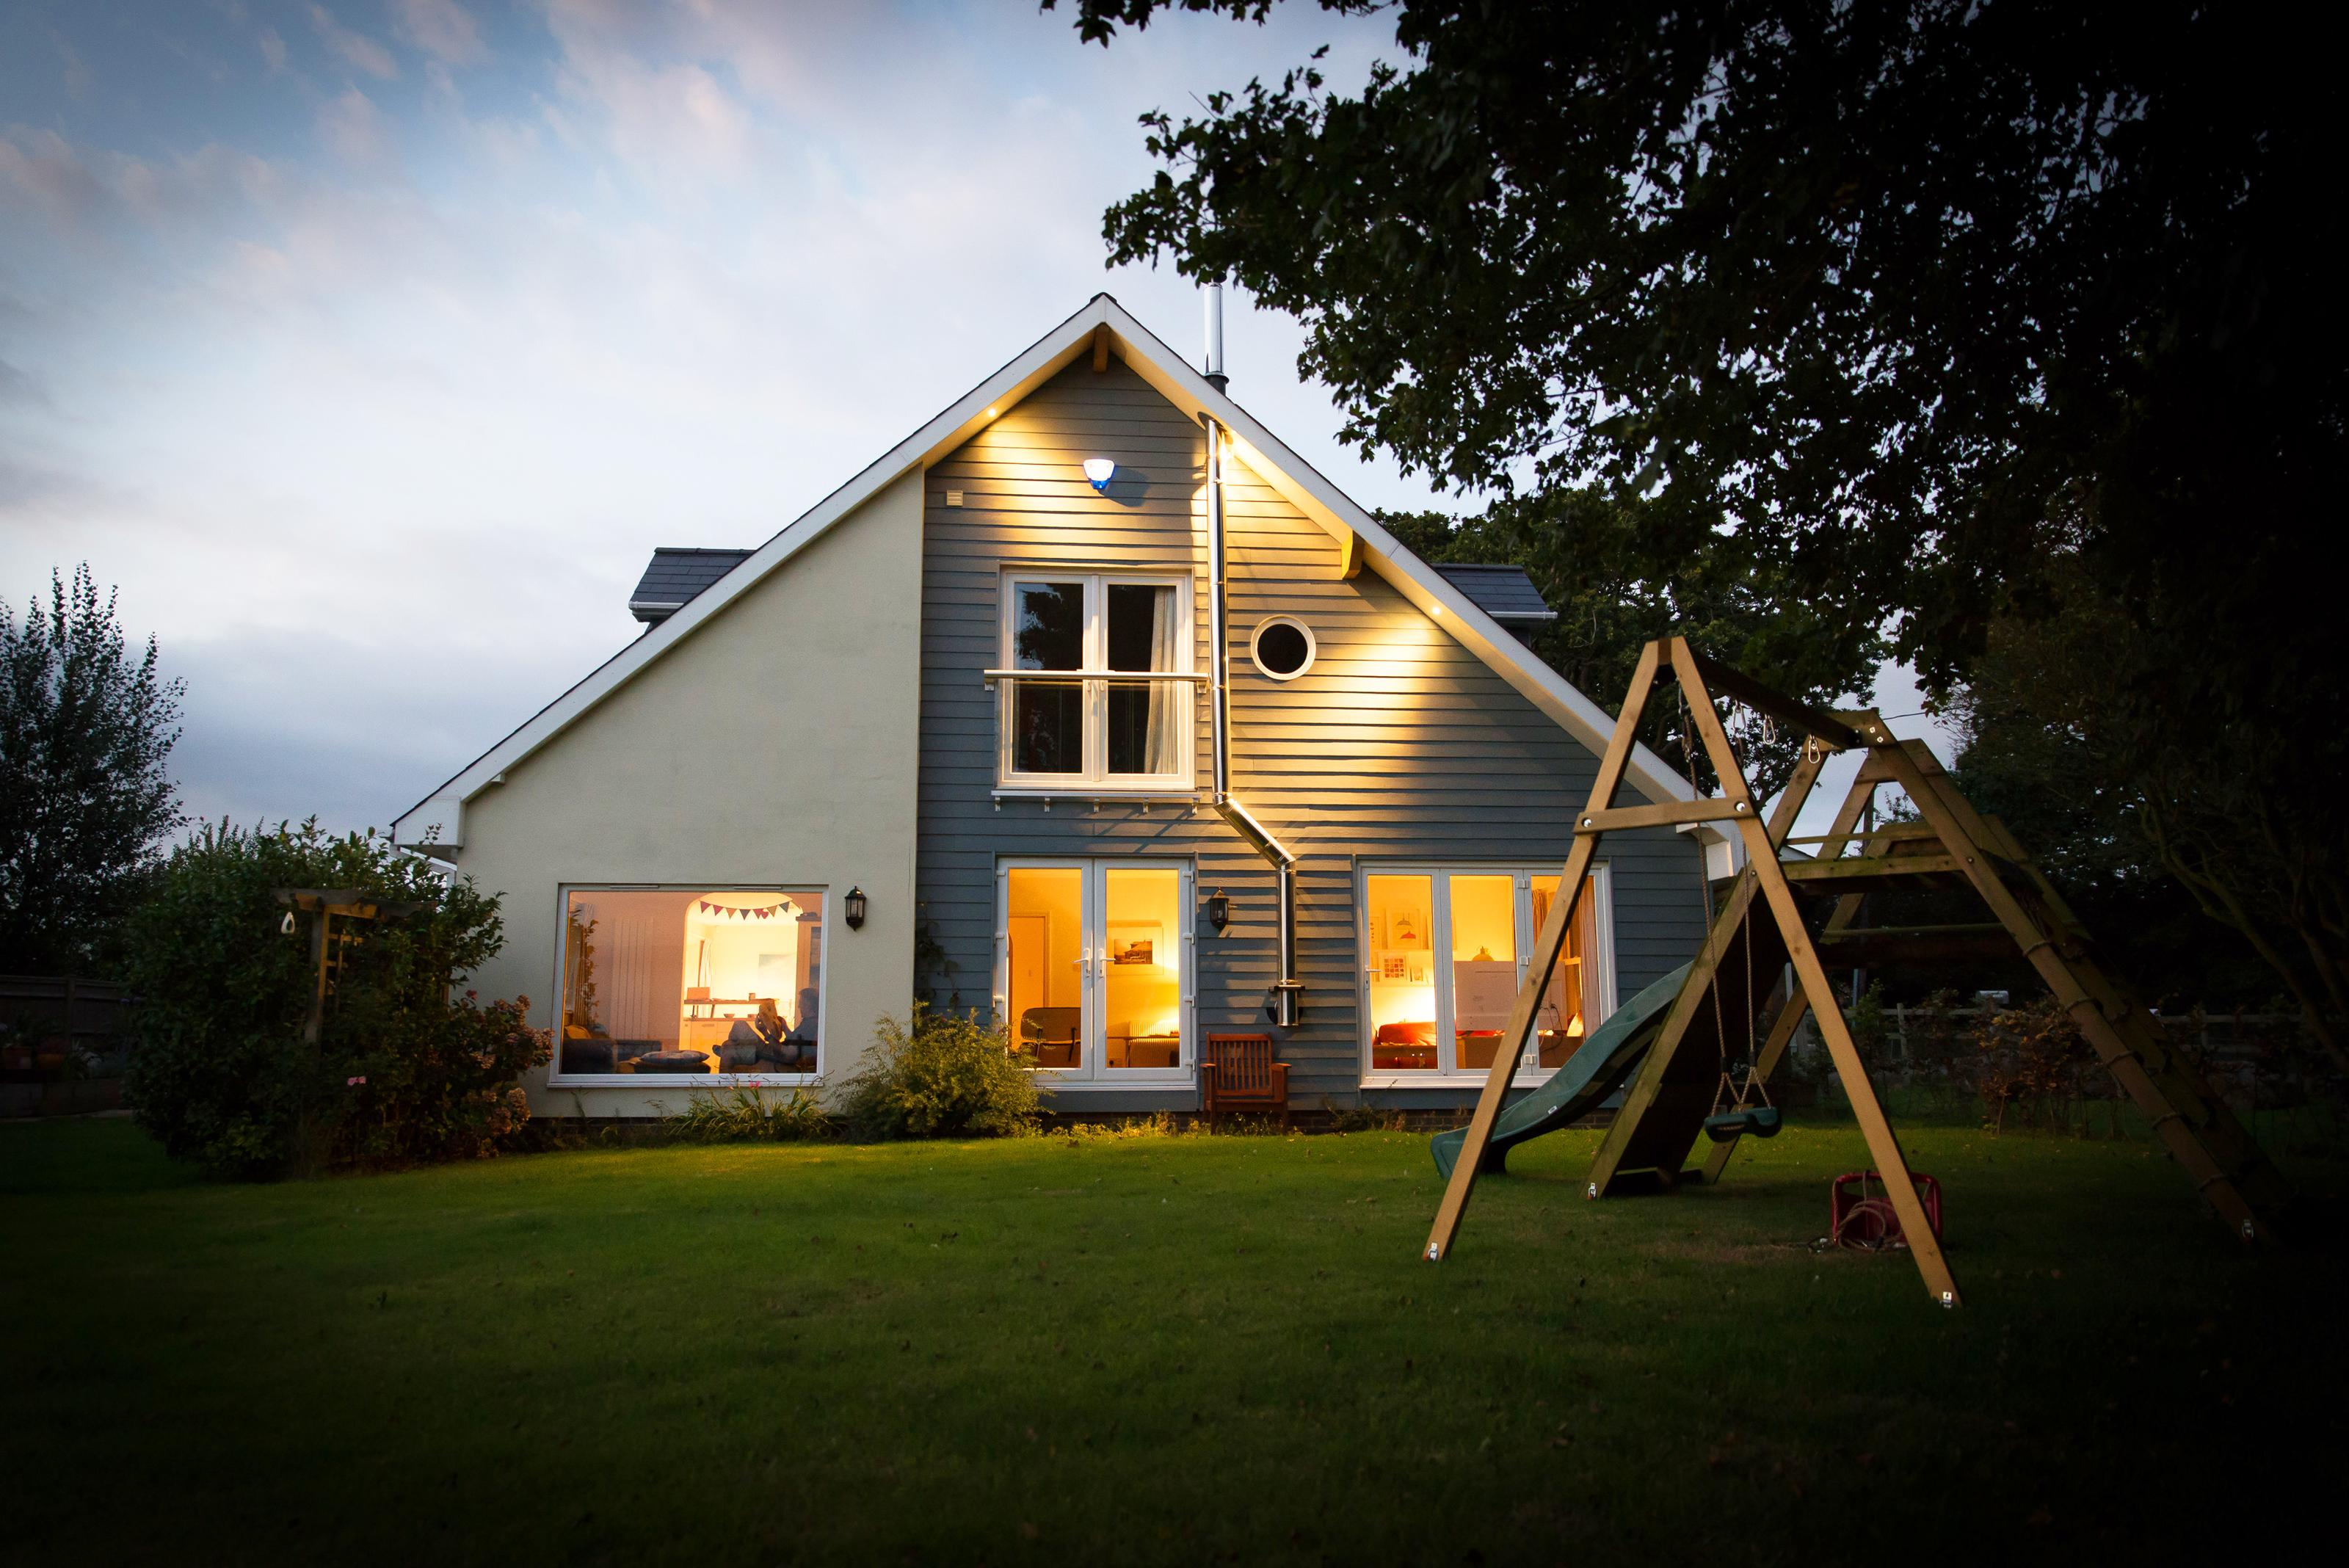 House with swing set illuminated at night   Prevent Burglary